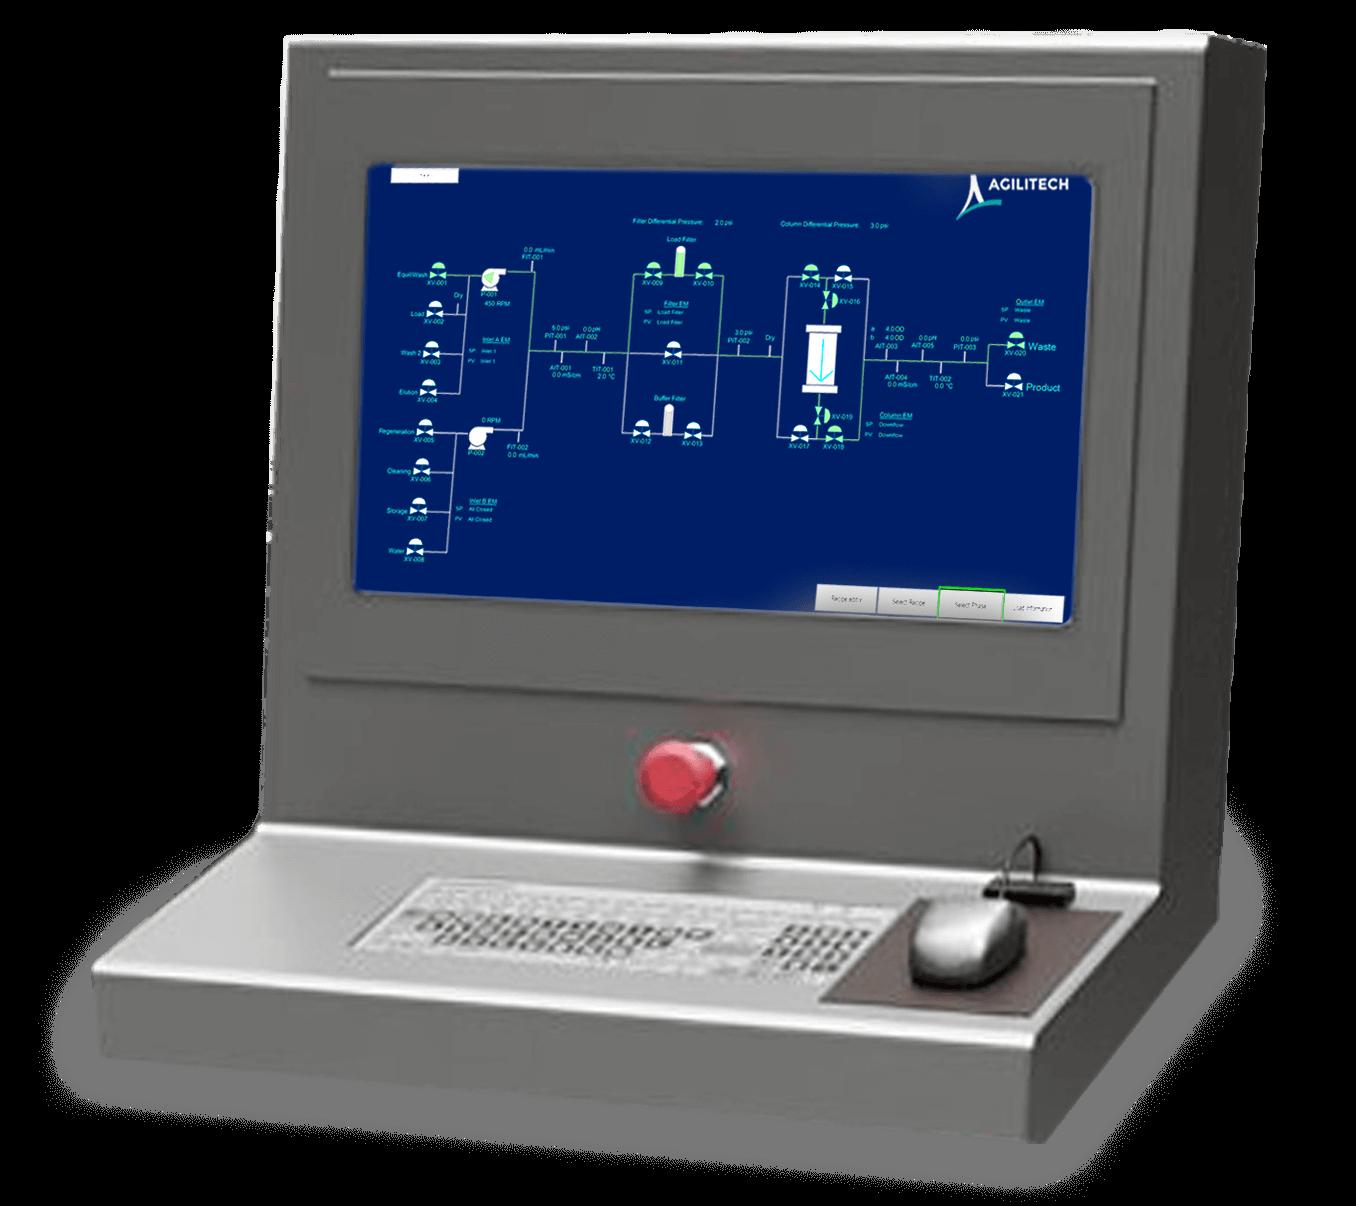 Agilitech Chromatography System Control Panel